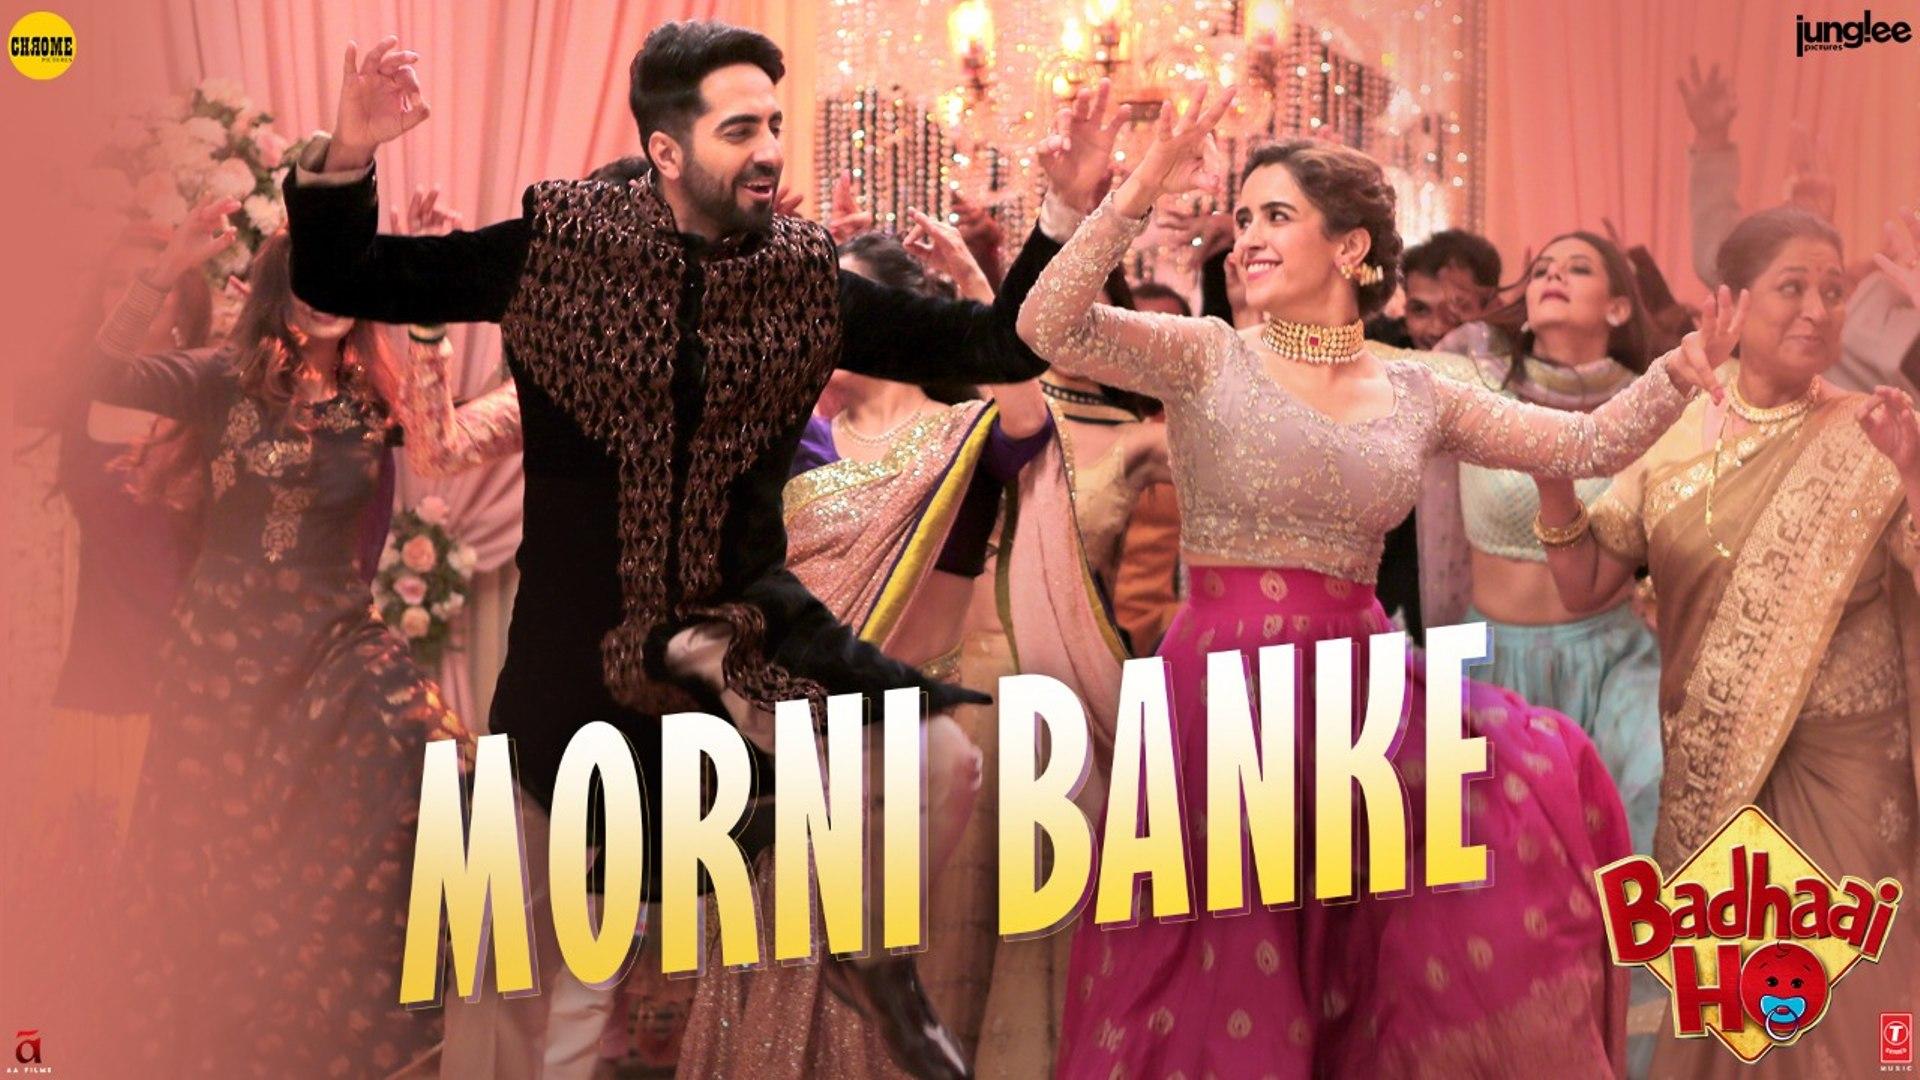 Engagement Songs Hindi, engagement songs bollywood, sagai song, punjabi engagement songs, gujarati engagement songs, engagement songs marathi, latest hindi songs for dance